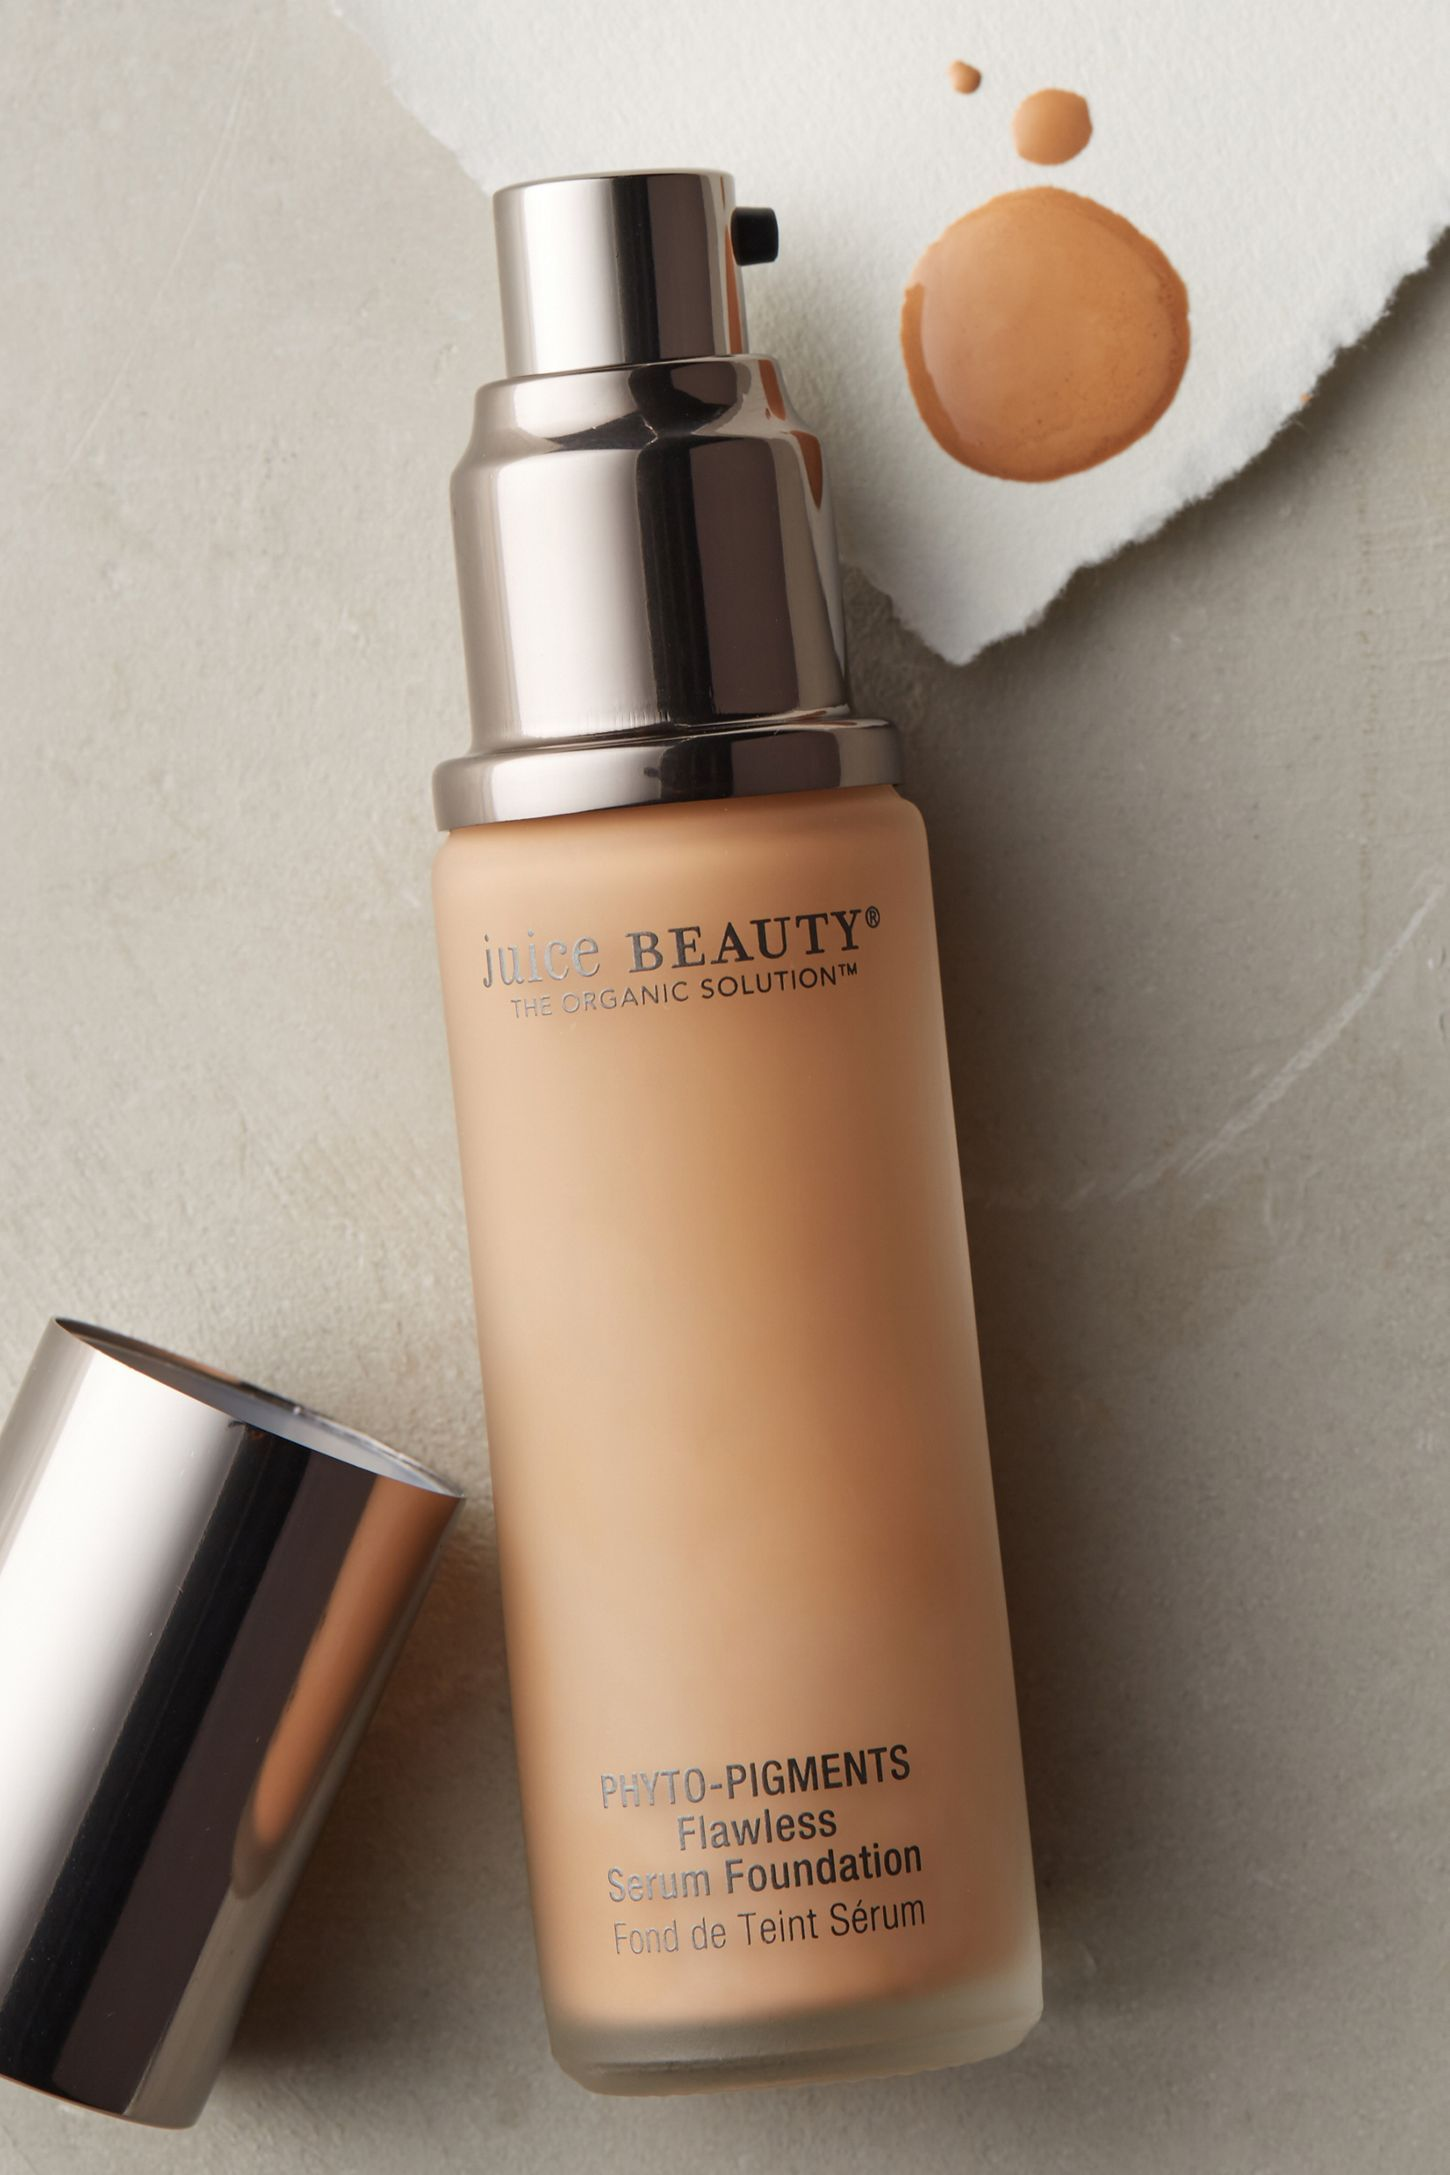 Juice Beauty PhytoPigments Flawless Serum Foundation